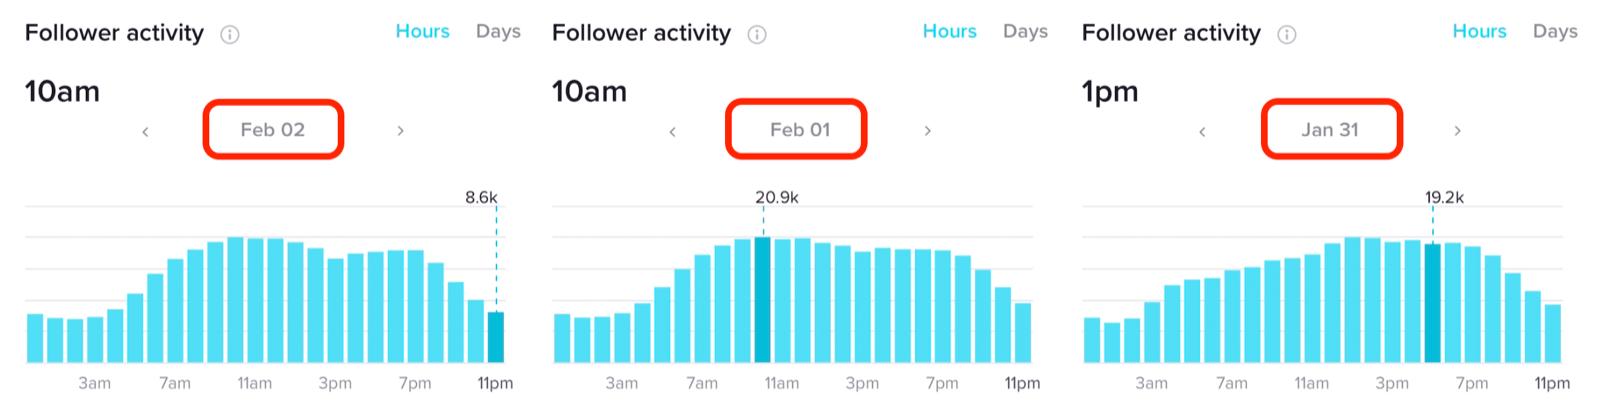 TikTok Analytics中连续几天的关注者活动数小时